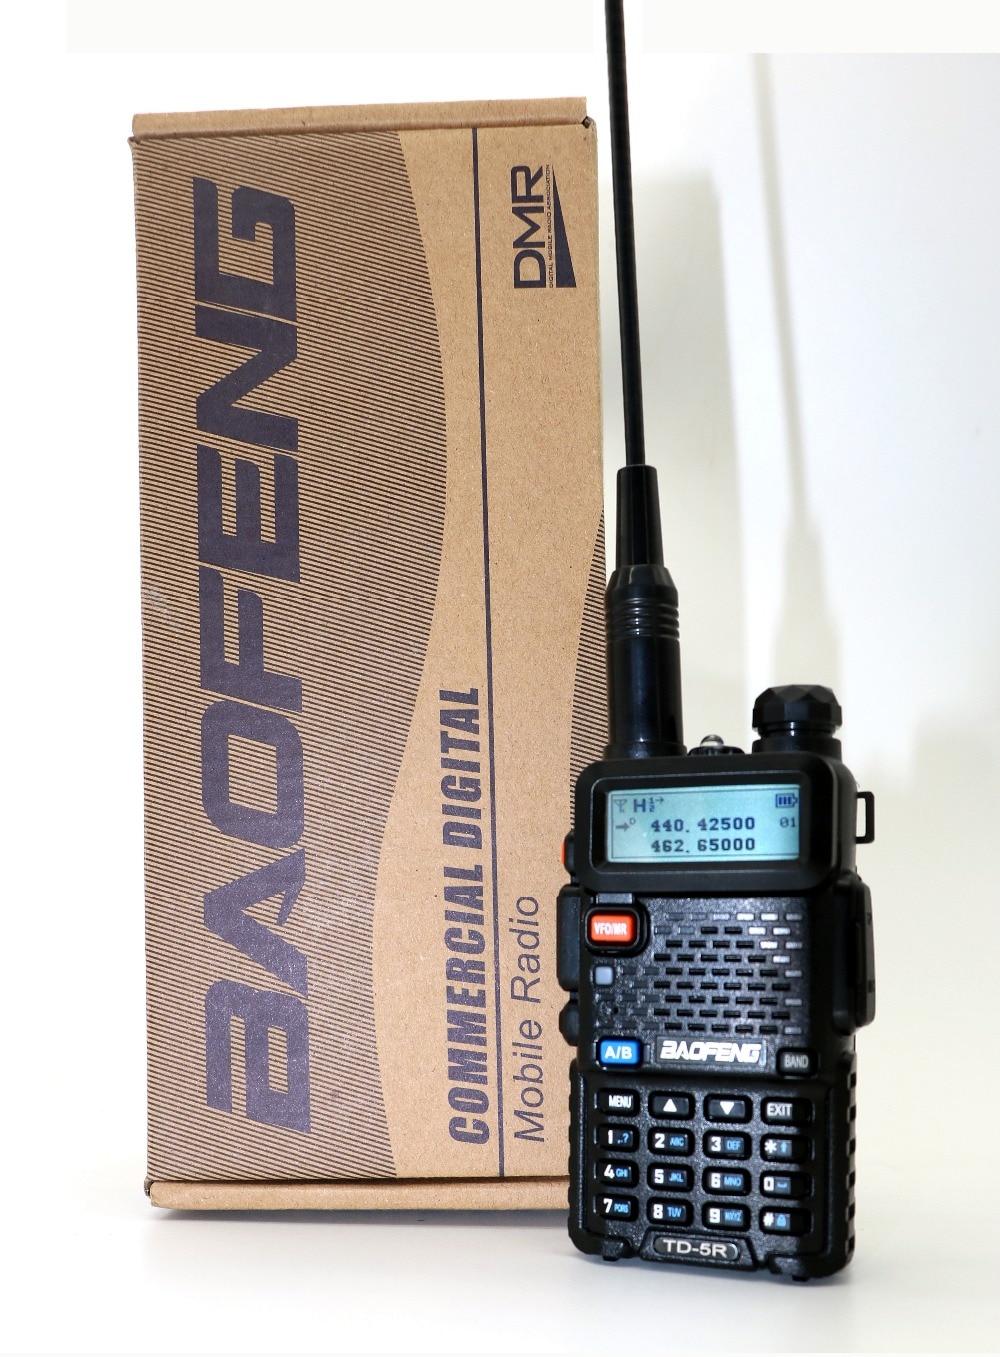 Baofeng Dual Slot di Tempo TD-5R Portatile Radio Dual Band tier2 & tier1 DMR Walkie Taklie Digital Anolog dual mode DM-5R serie Radio